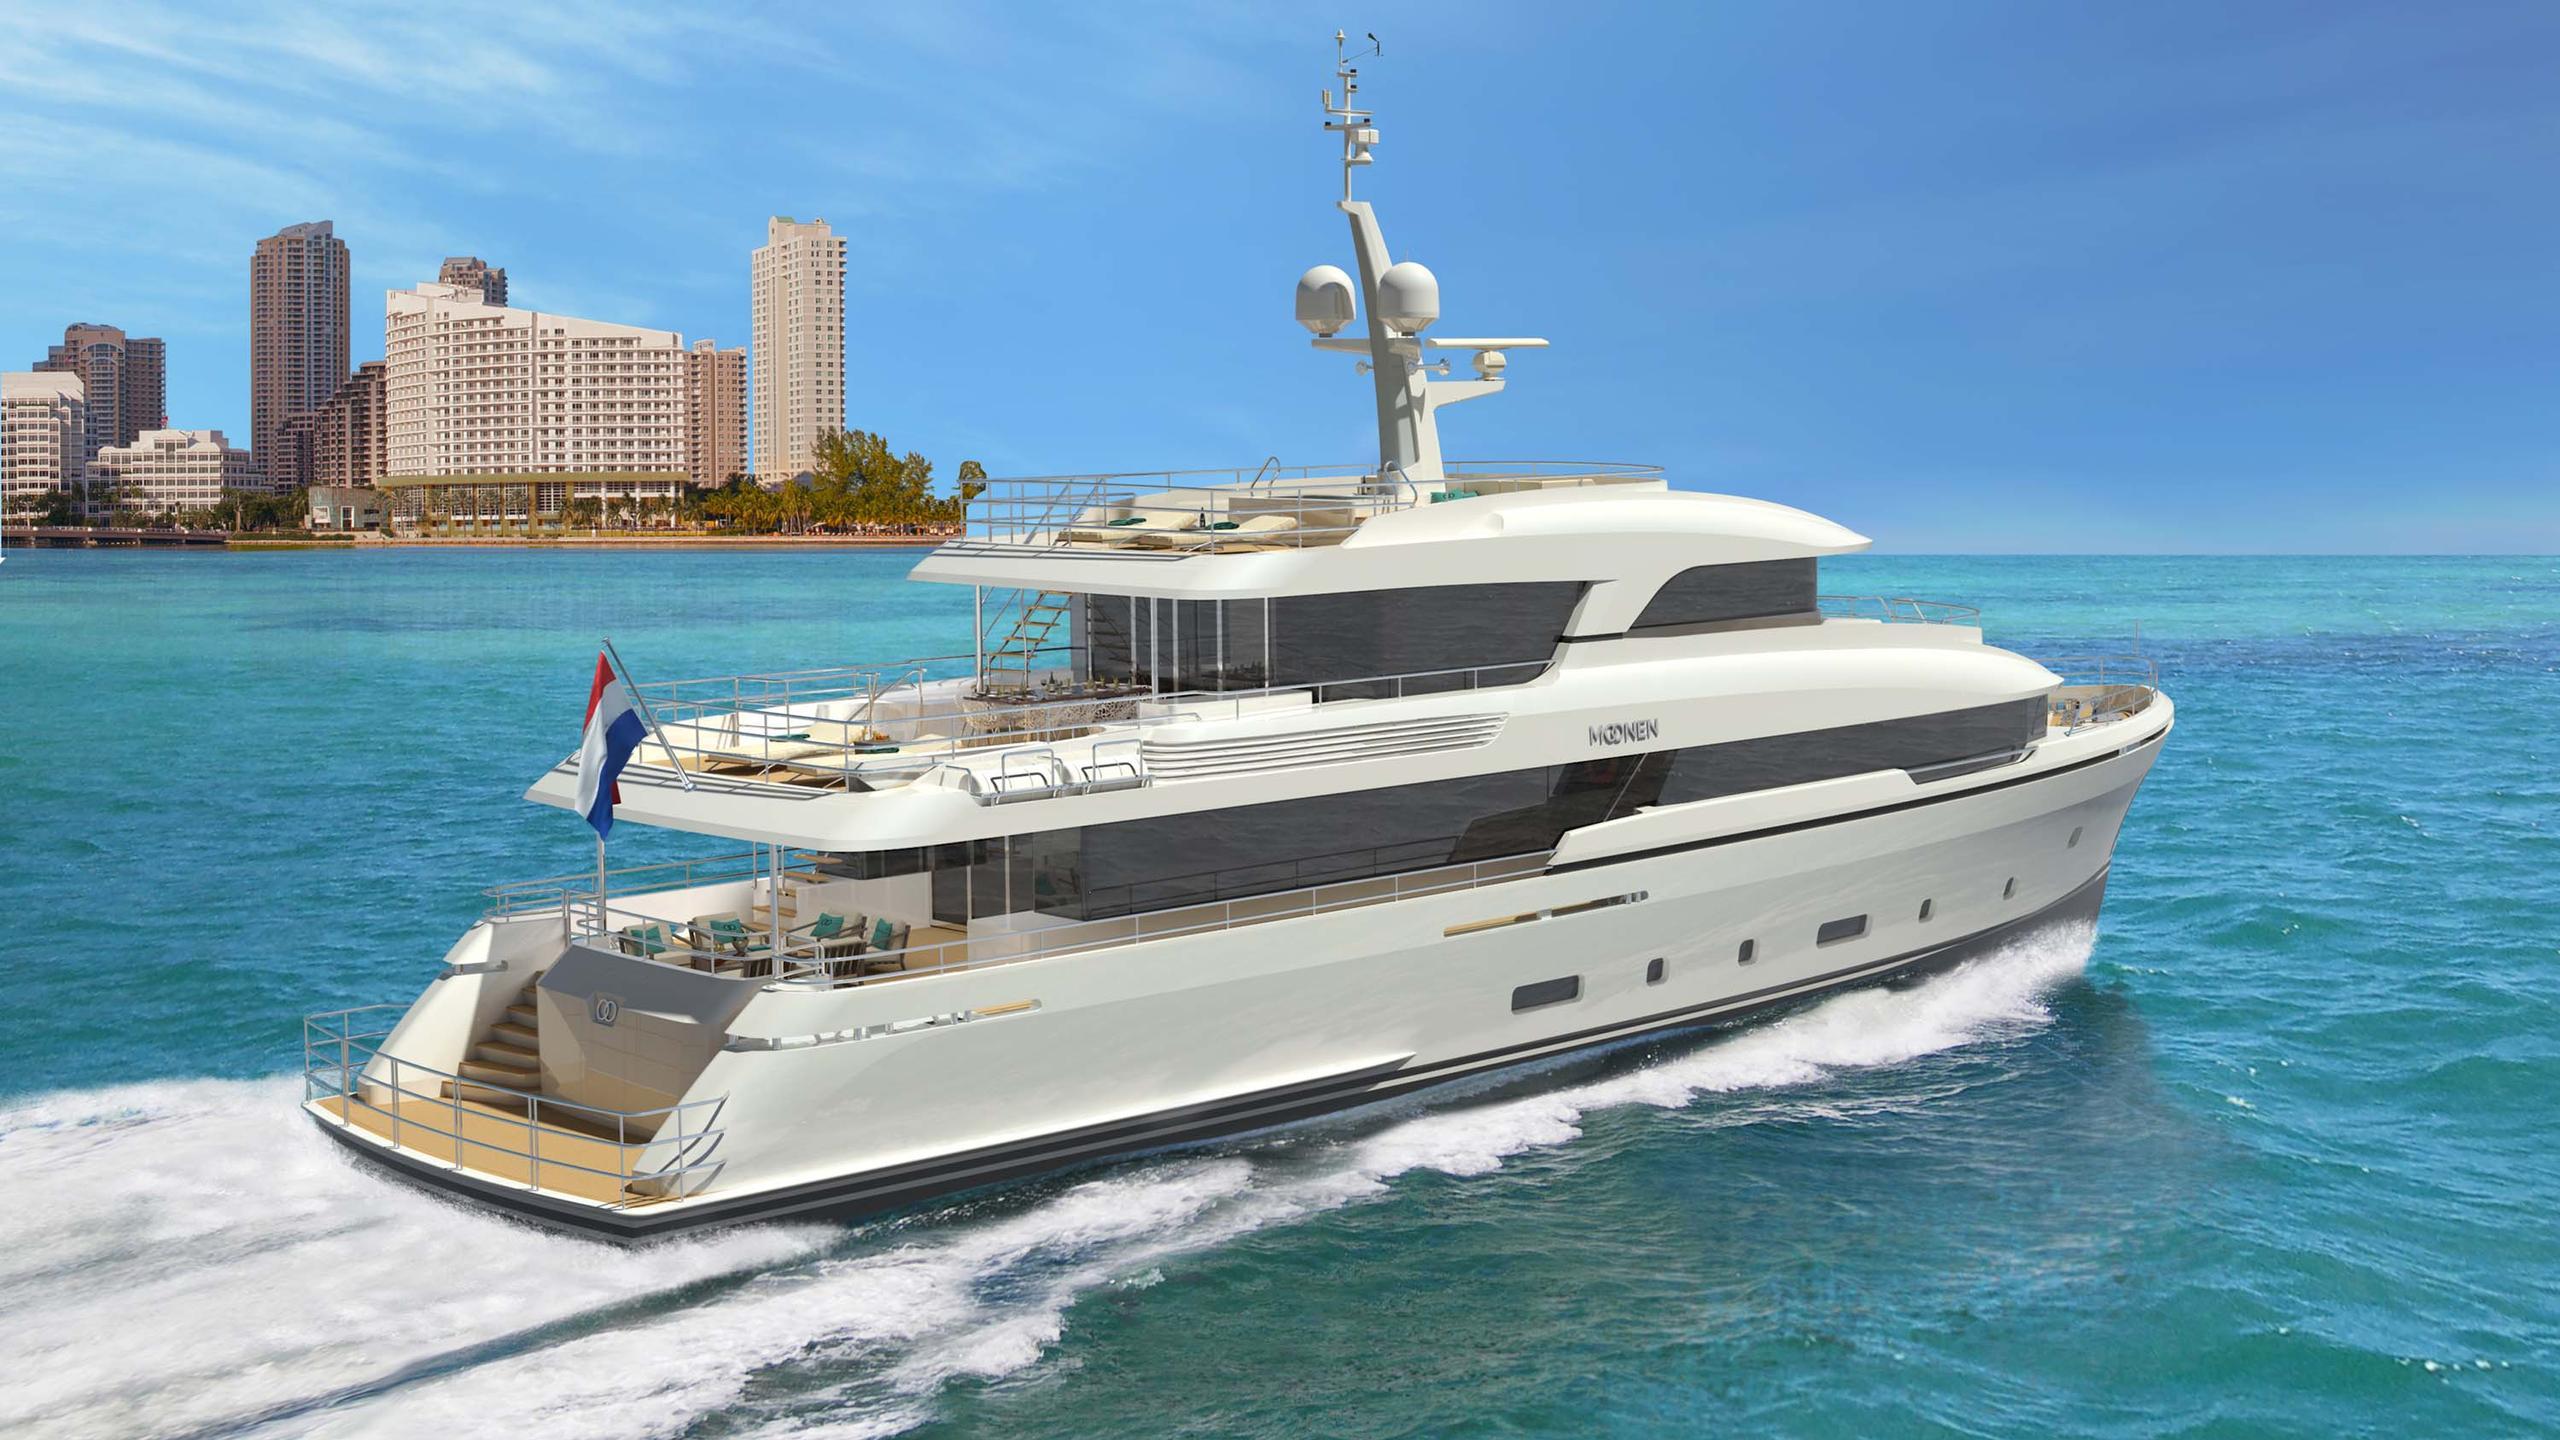 martinique motoryacht moonen 2018 36m rendering half stern cruising